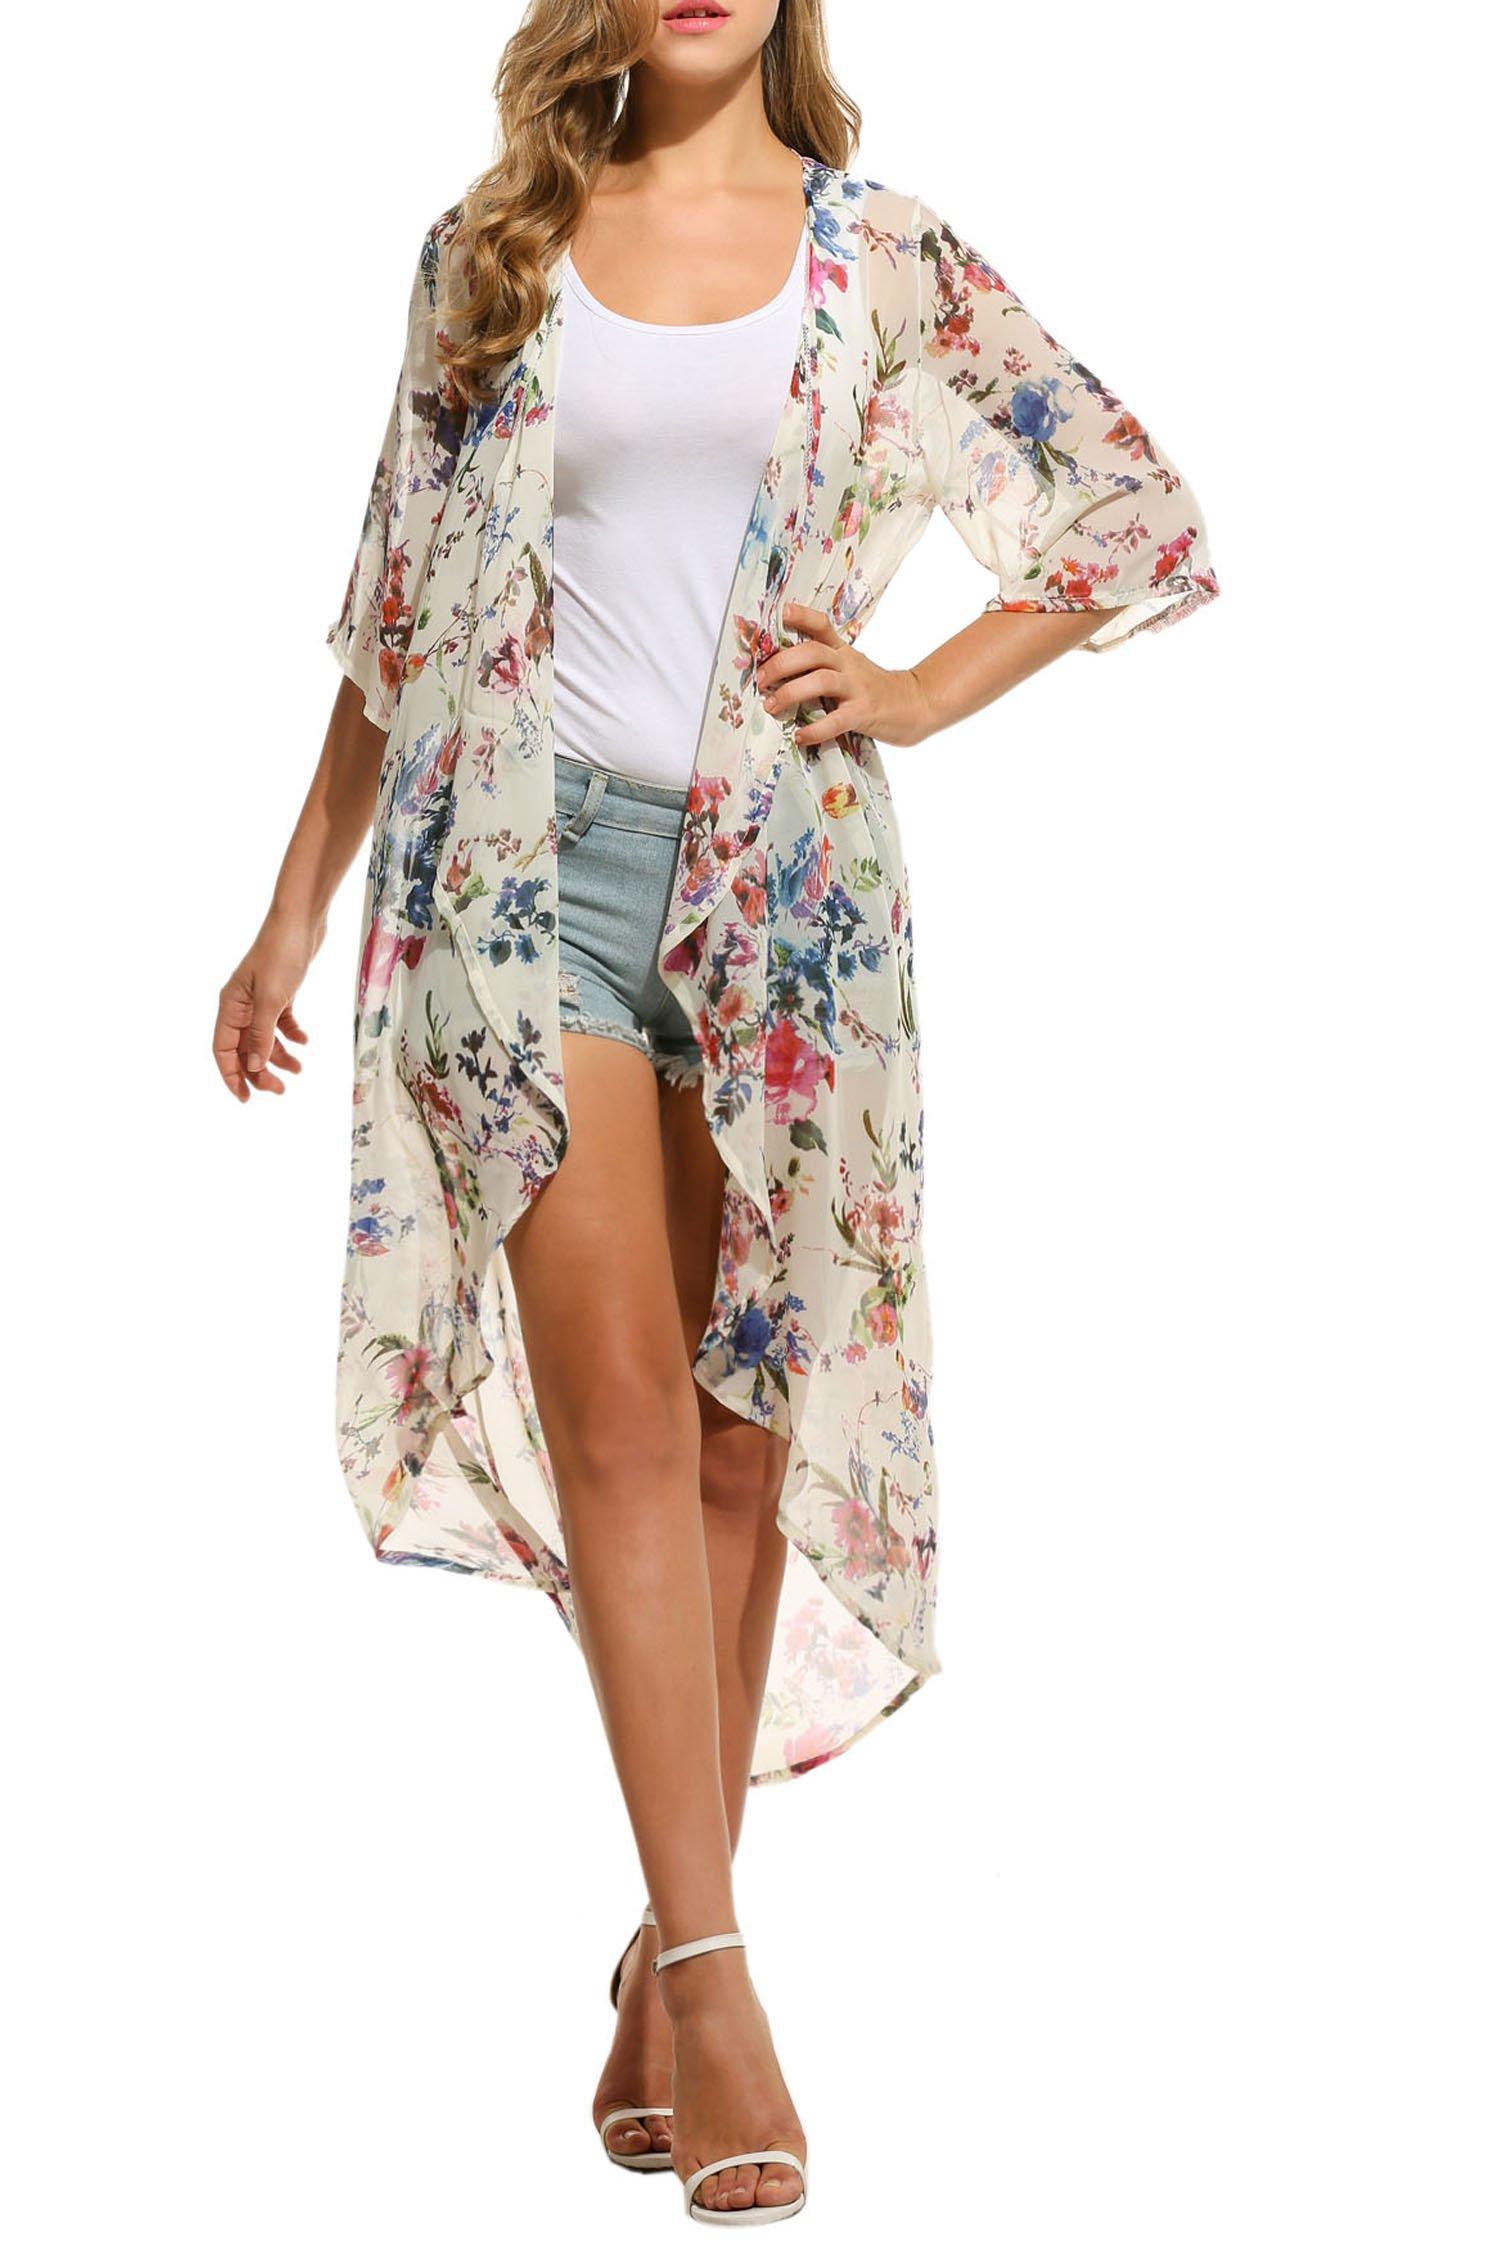 Ekouaer Women's Chiffon Cardigan 3 4 Sleeves Kimono Beach Bikini High Low Long Floral Cover up